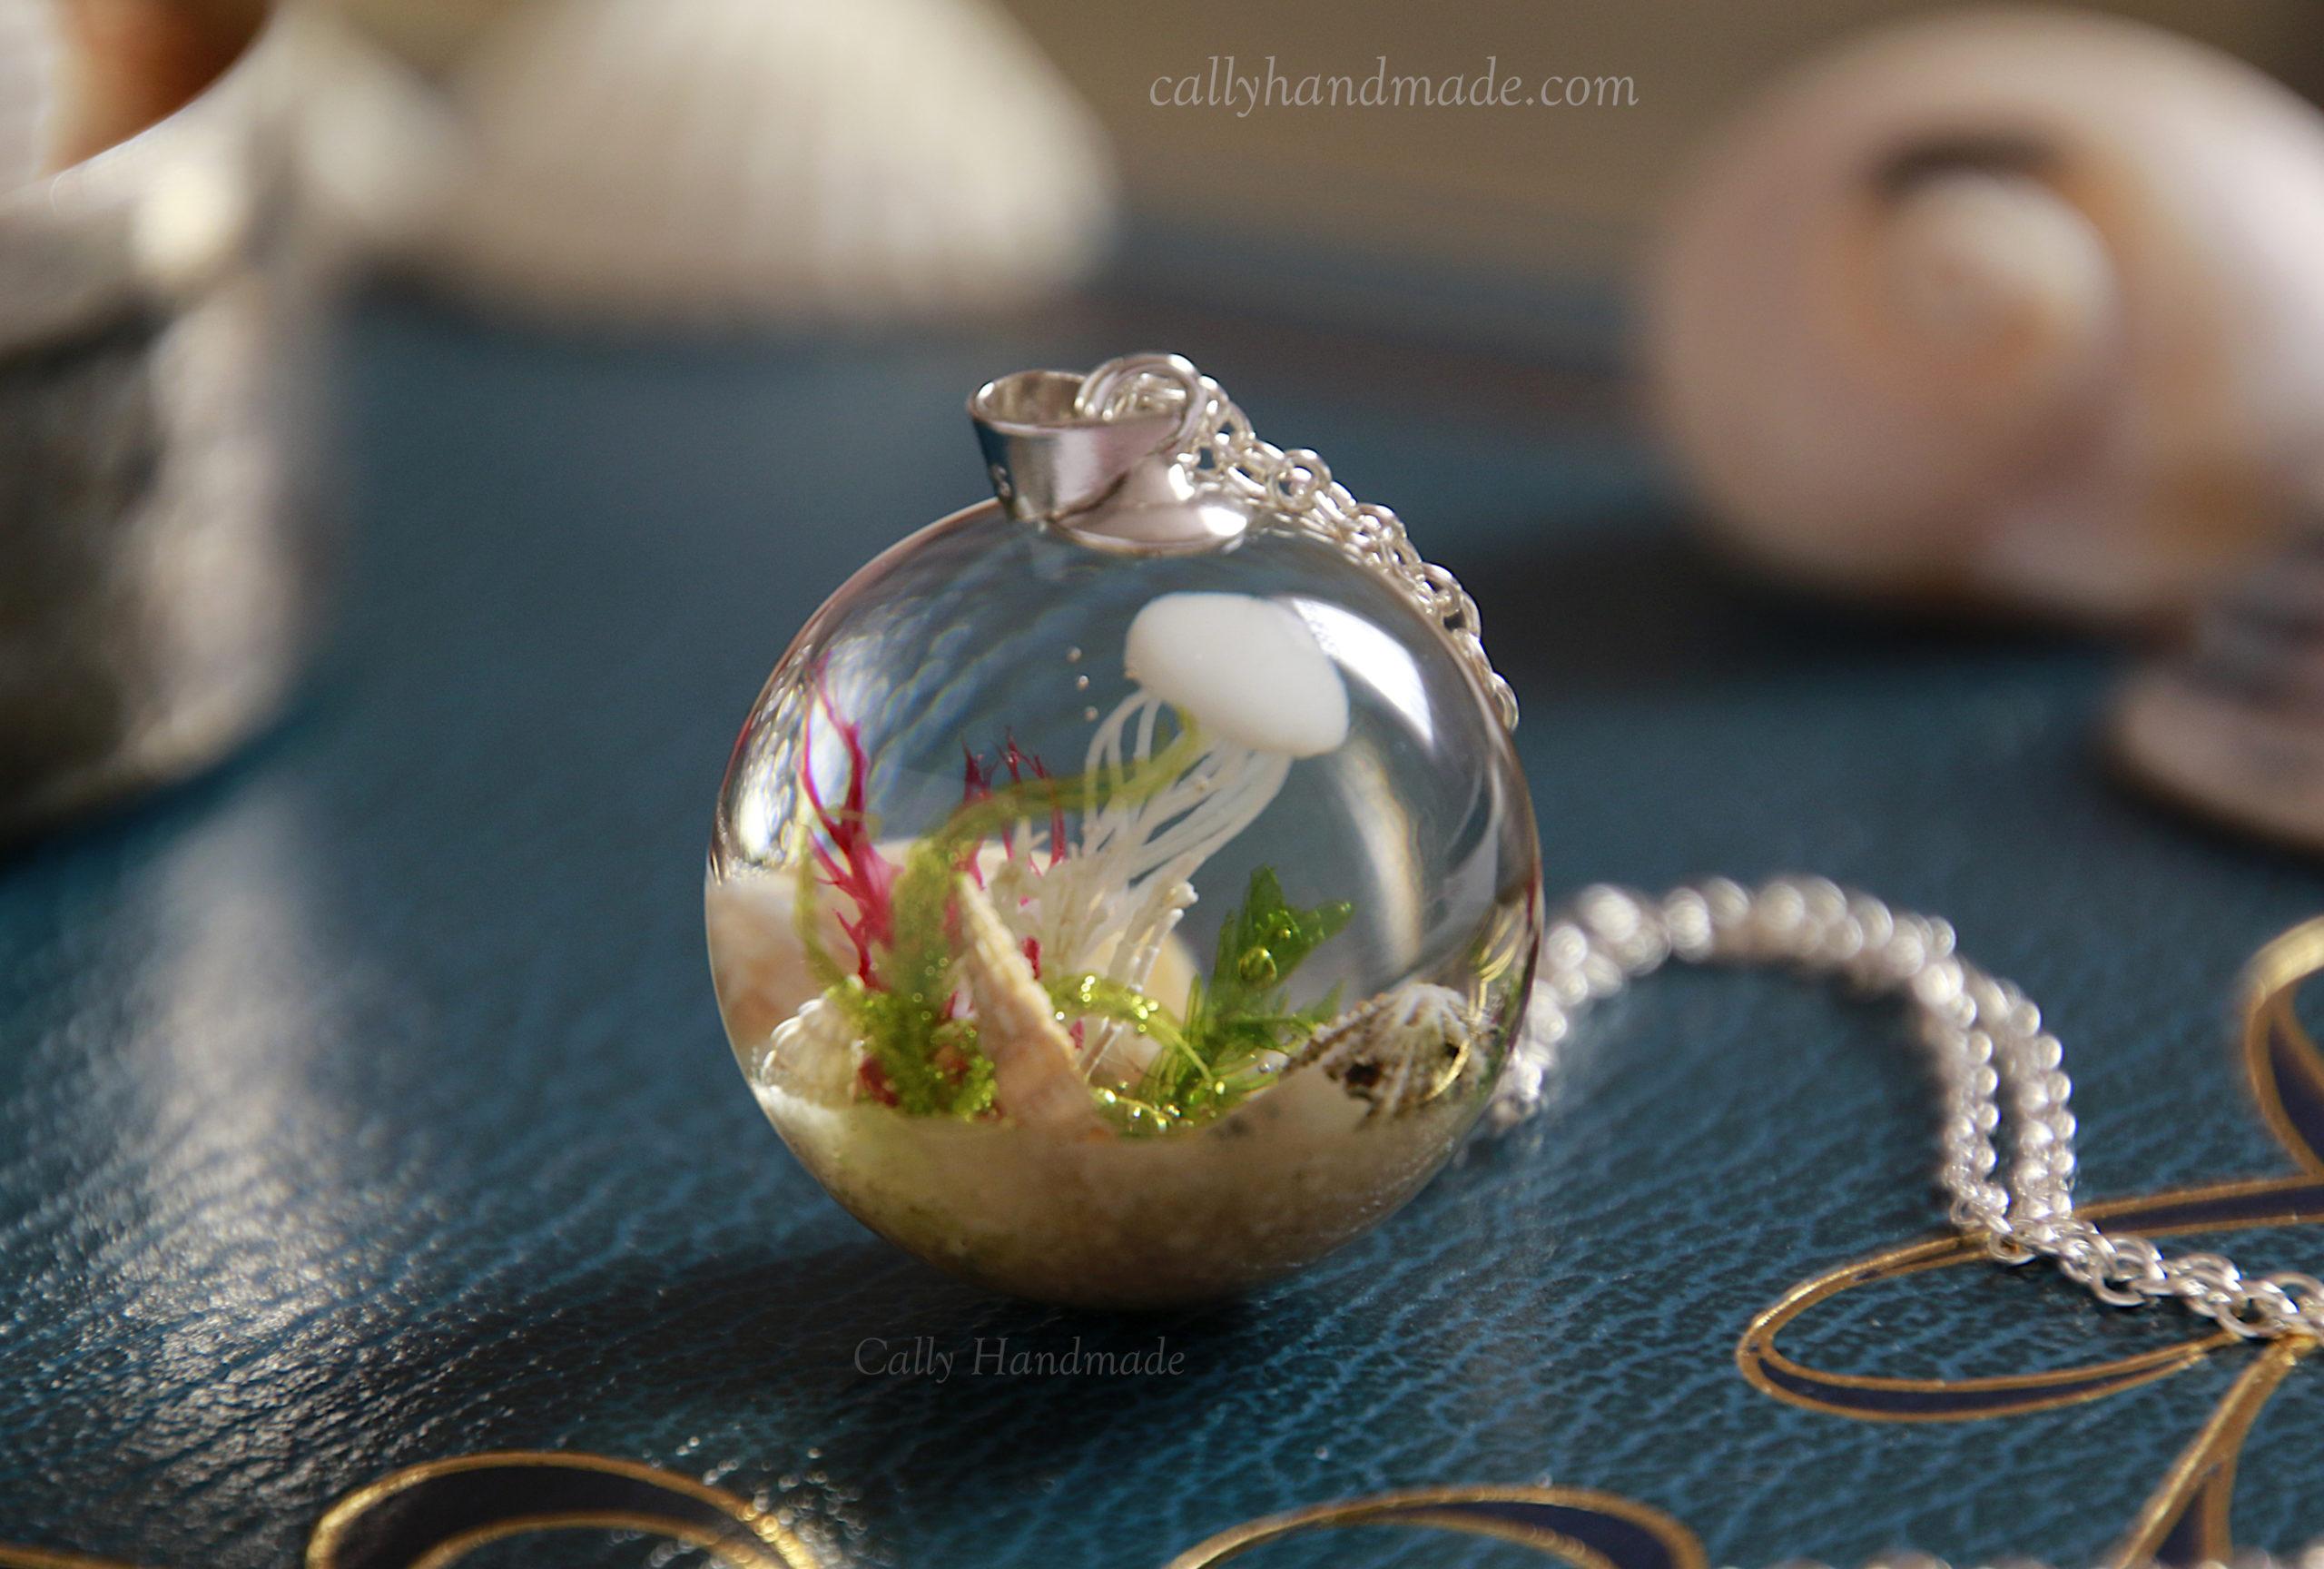 collier mer fait main handmade made in france